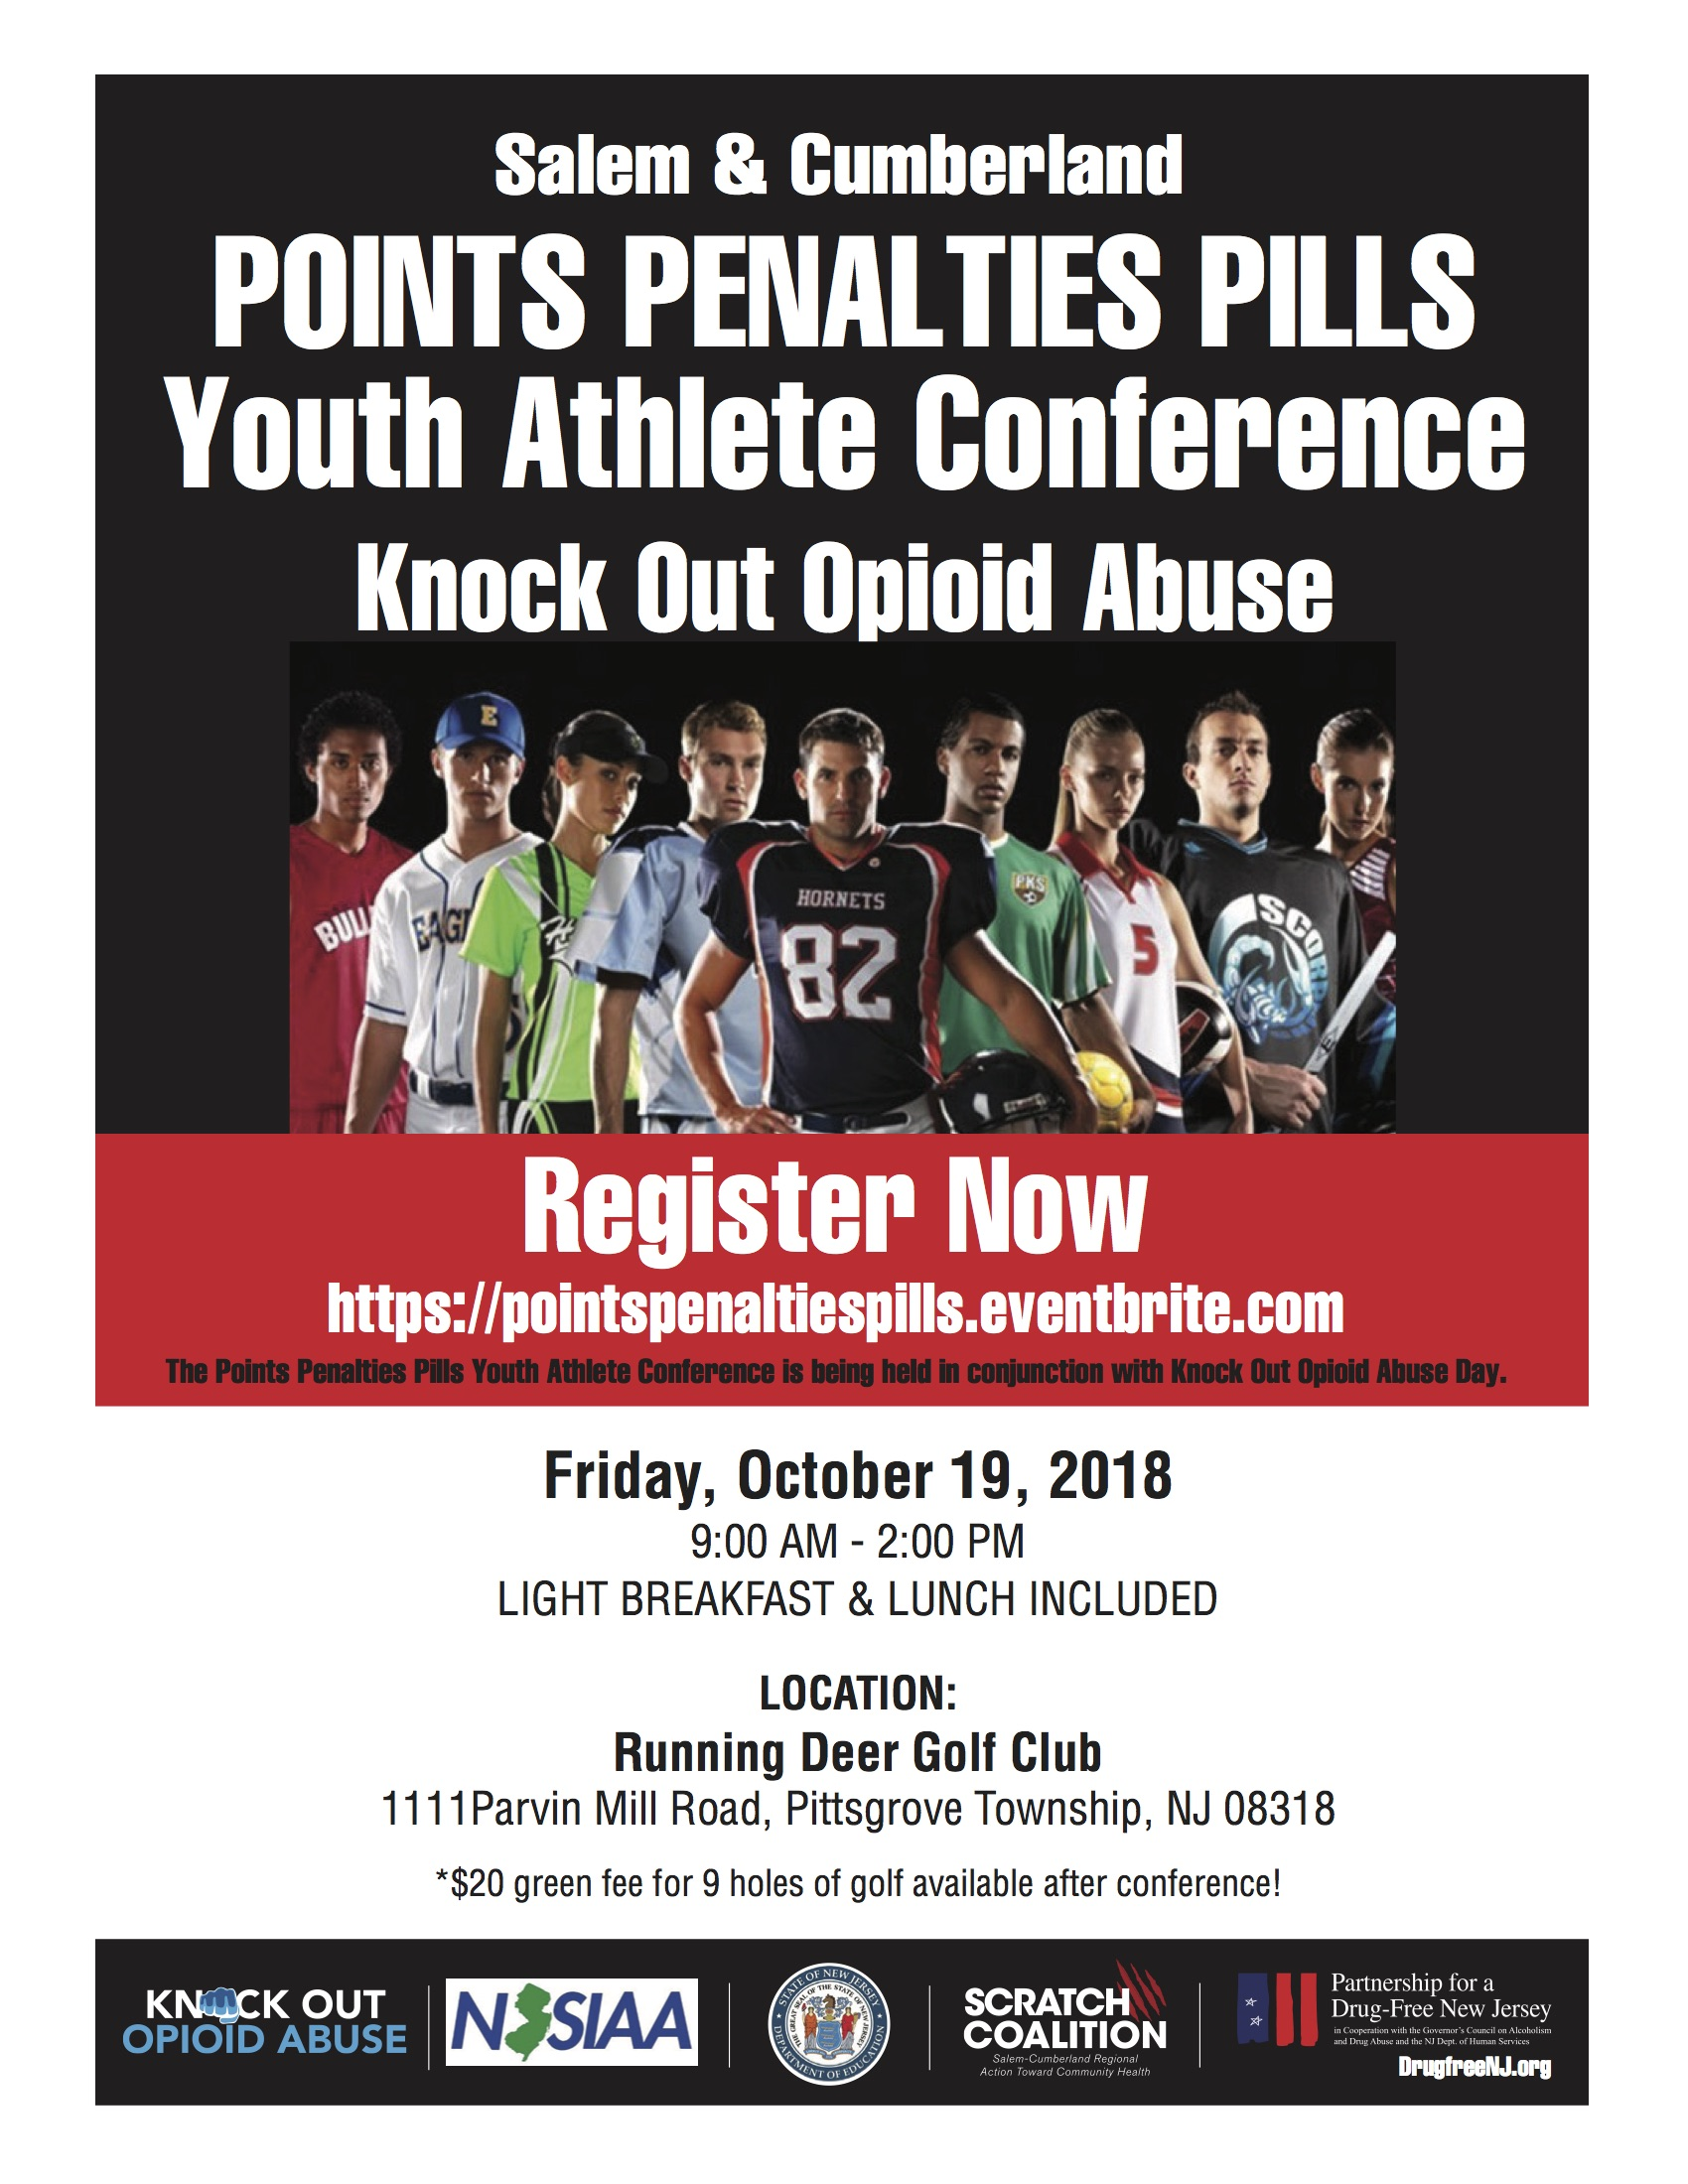 Points Penalties Pills Flyer.jpg